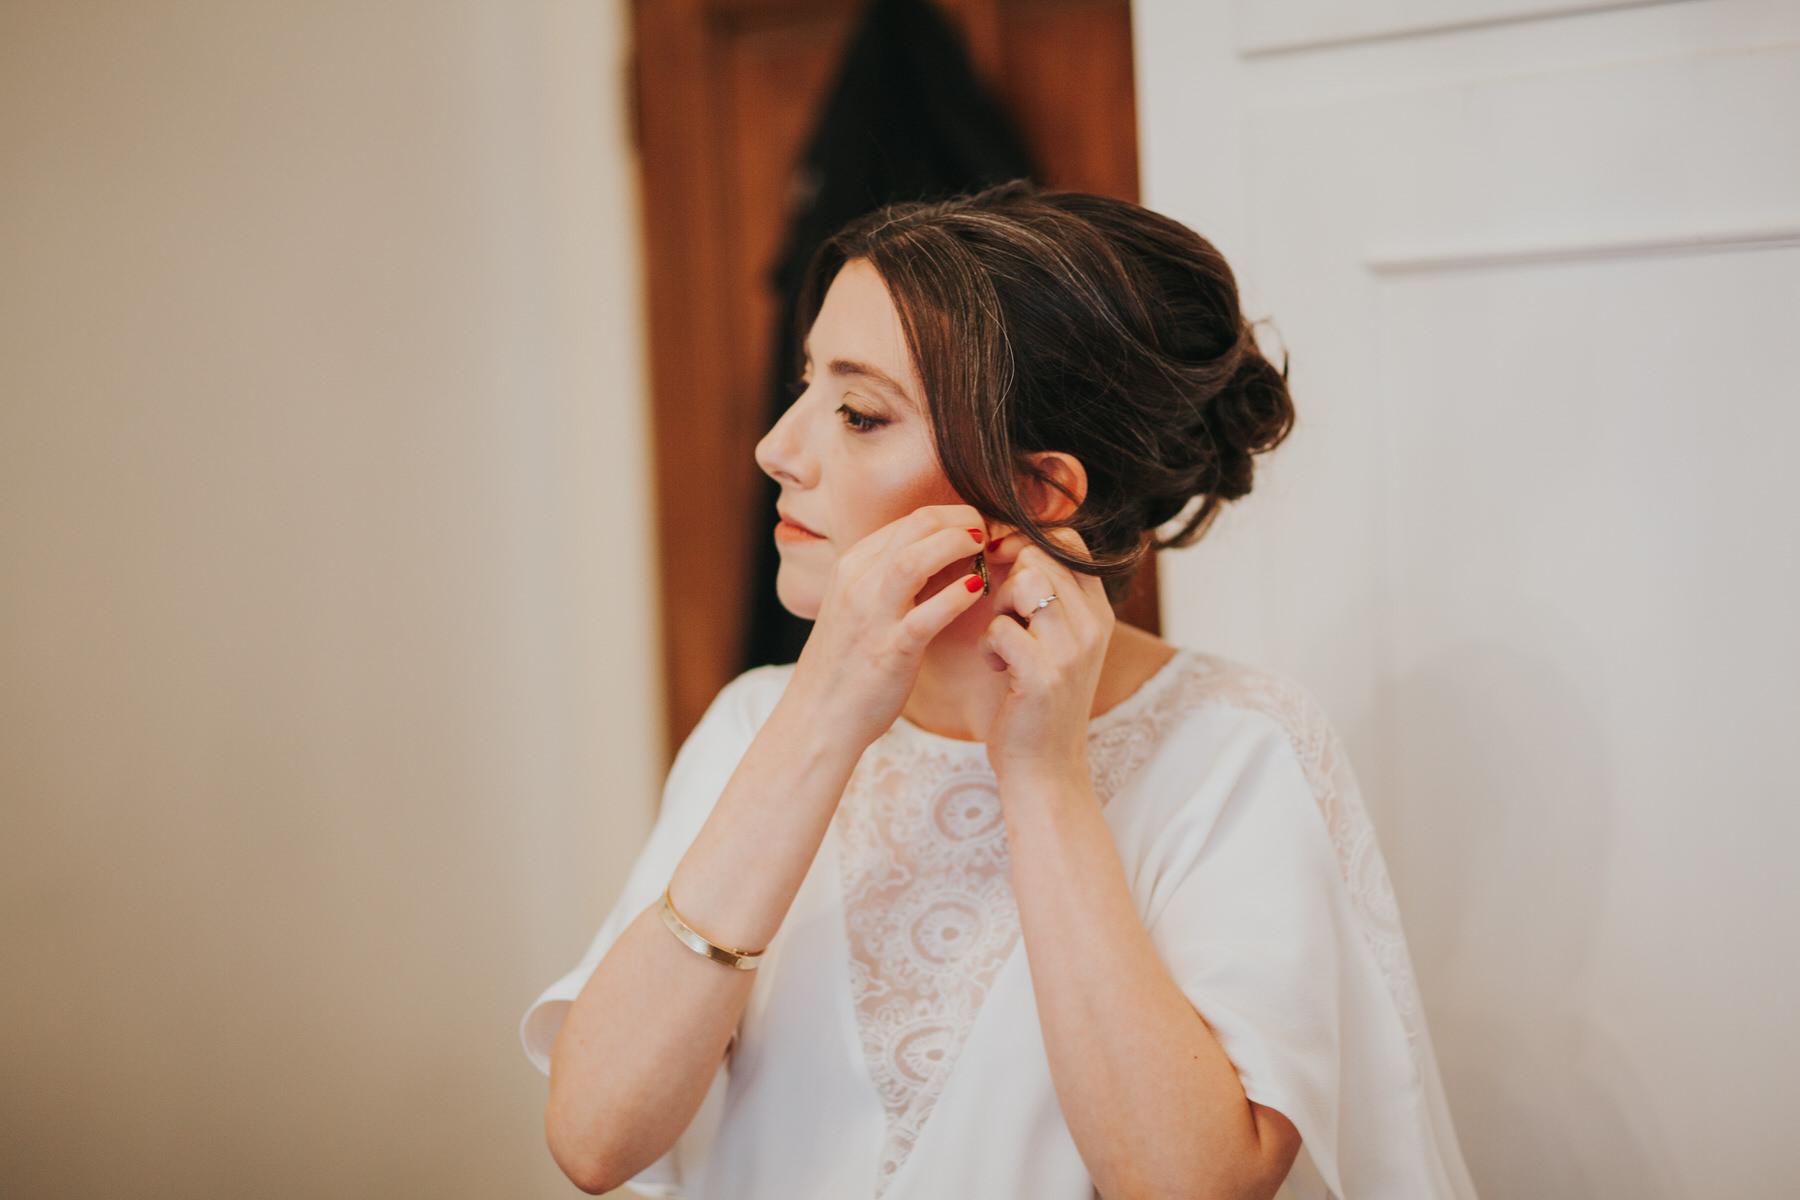 earings clipped bride getting ready Minna wedding dress.jpg